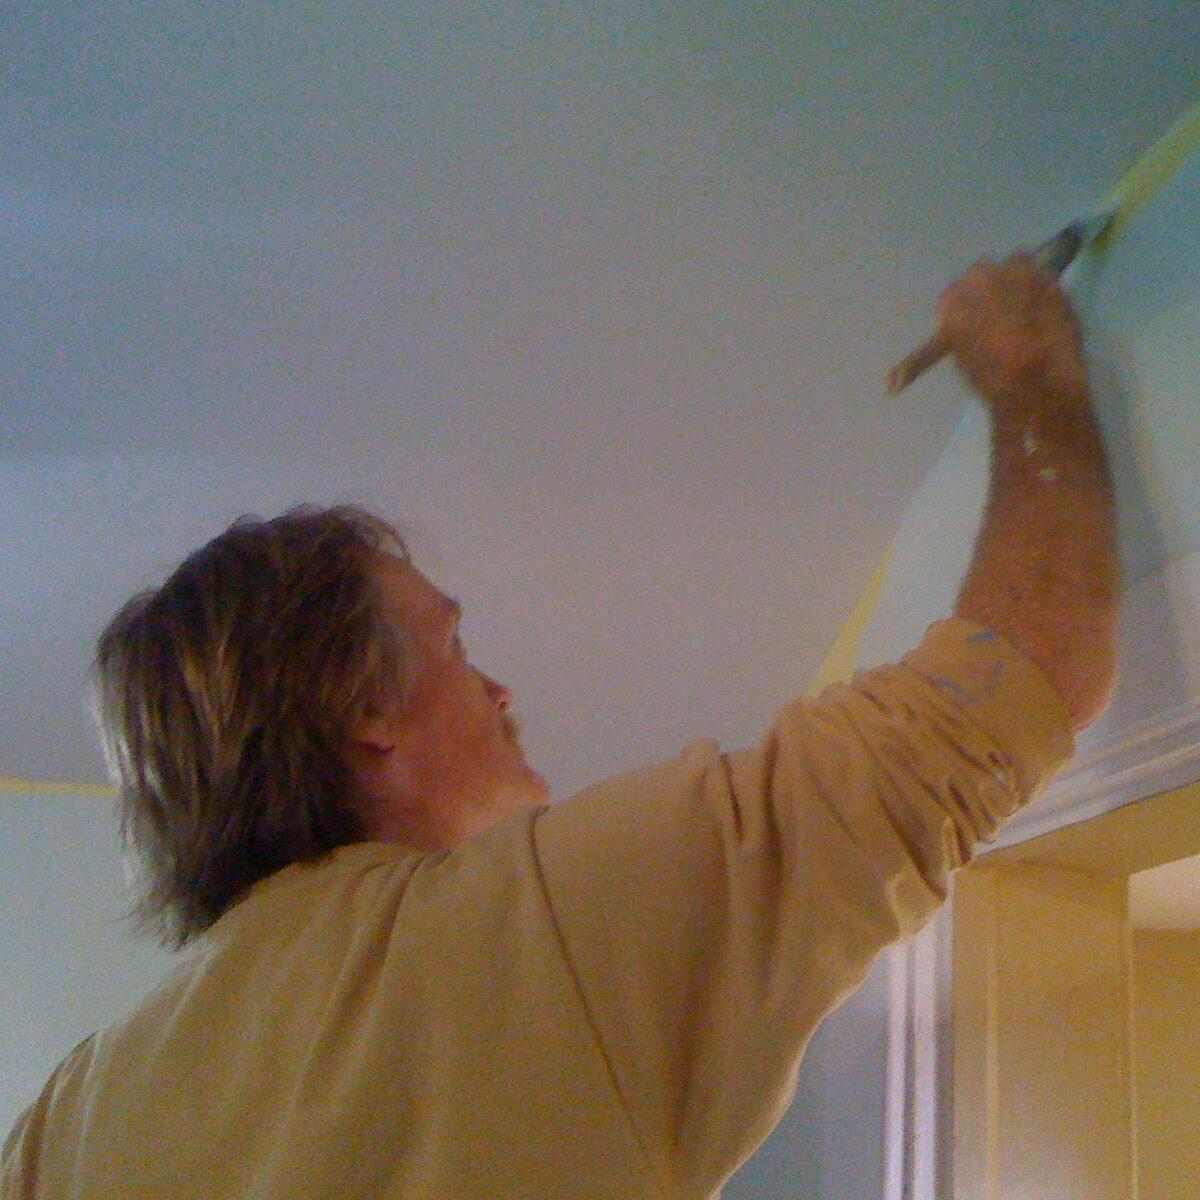 Volunteer Michael Aitchison applying a fresh coat of paint in 2010.